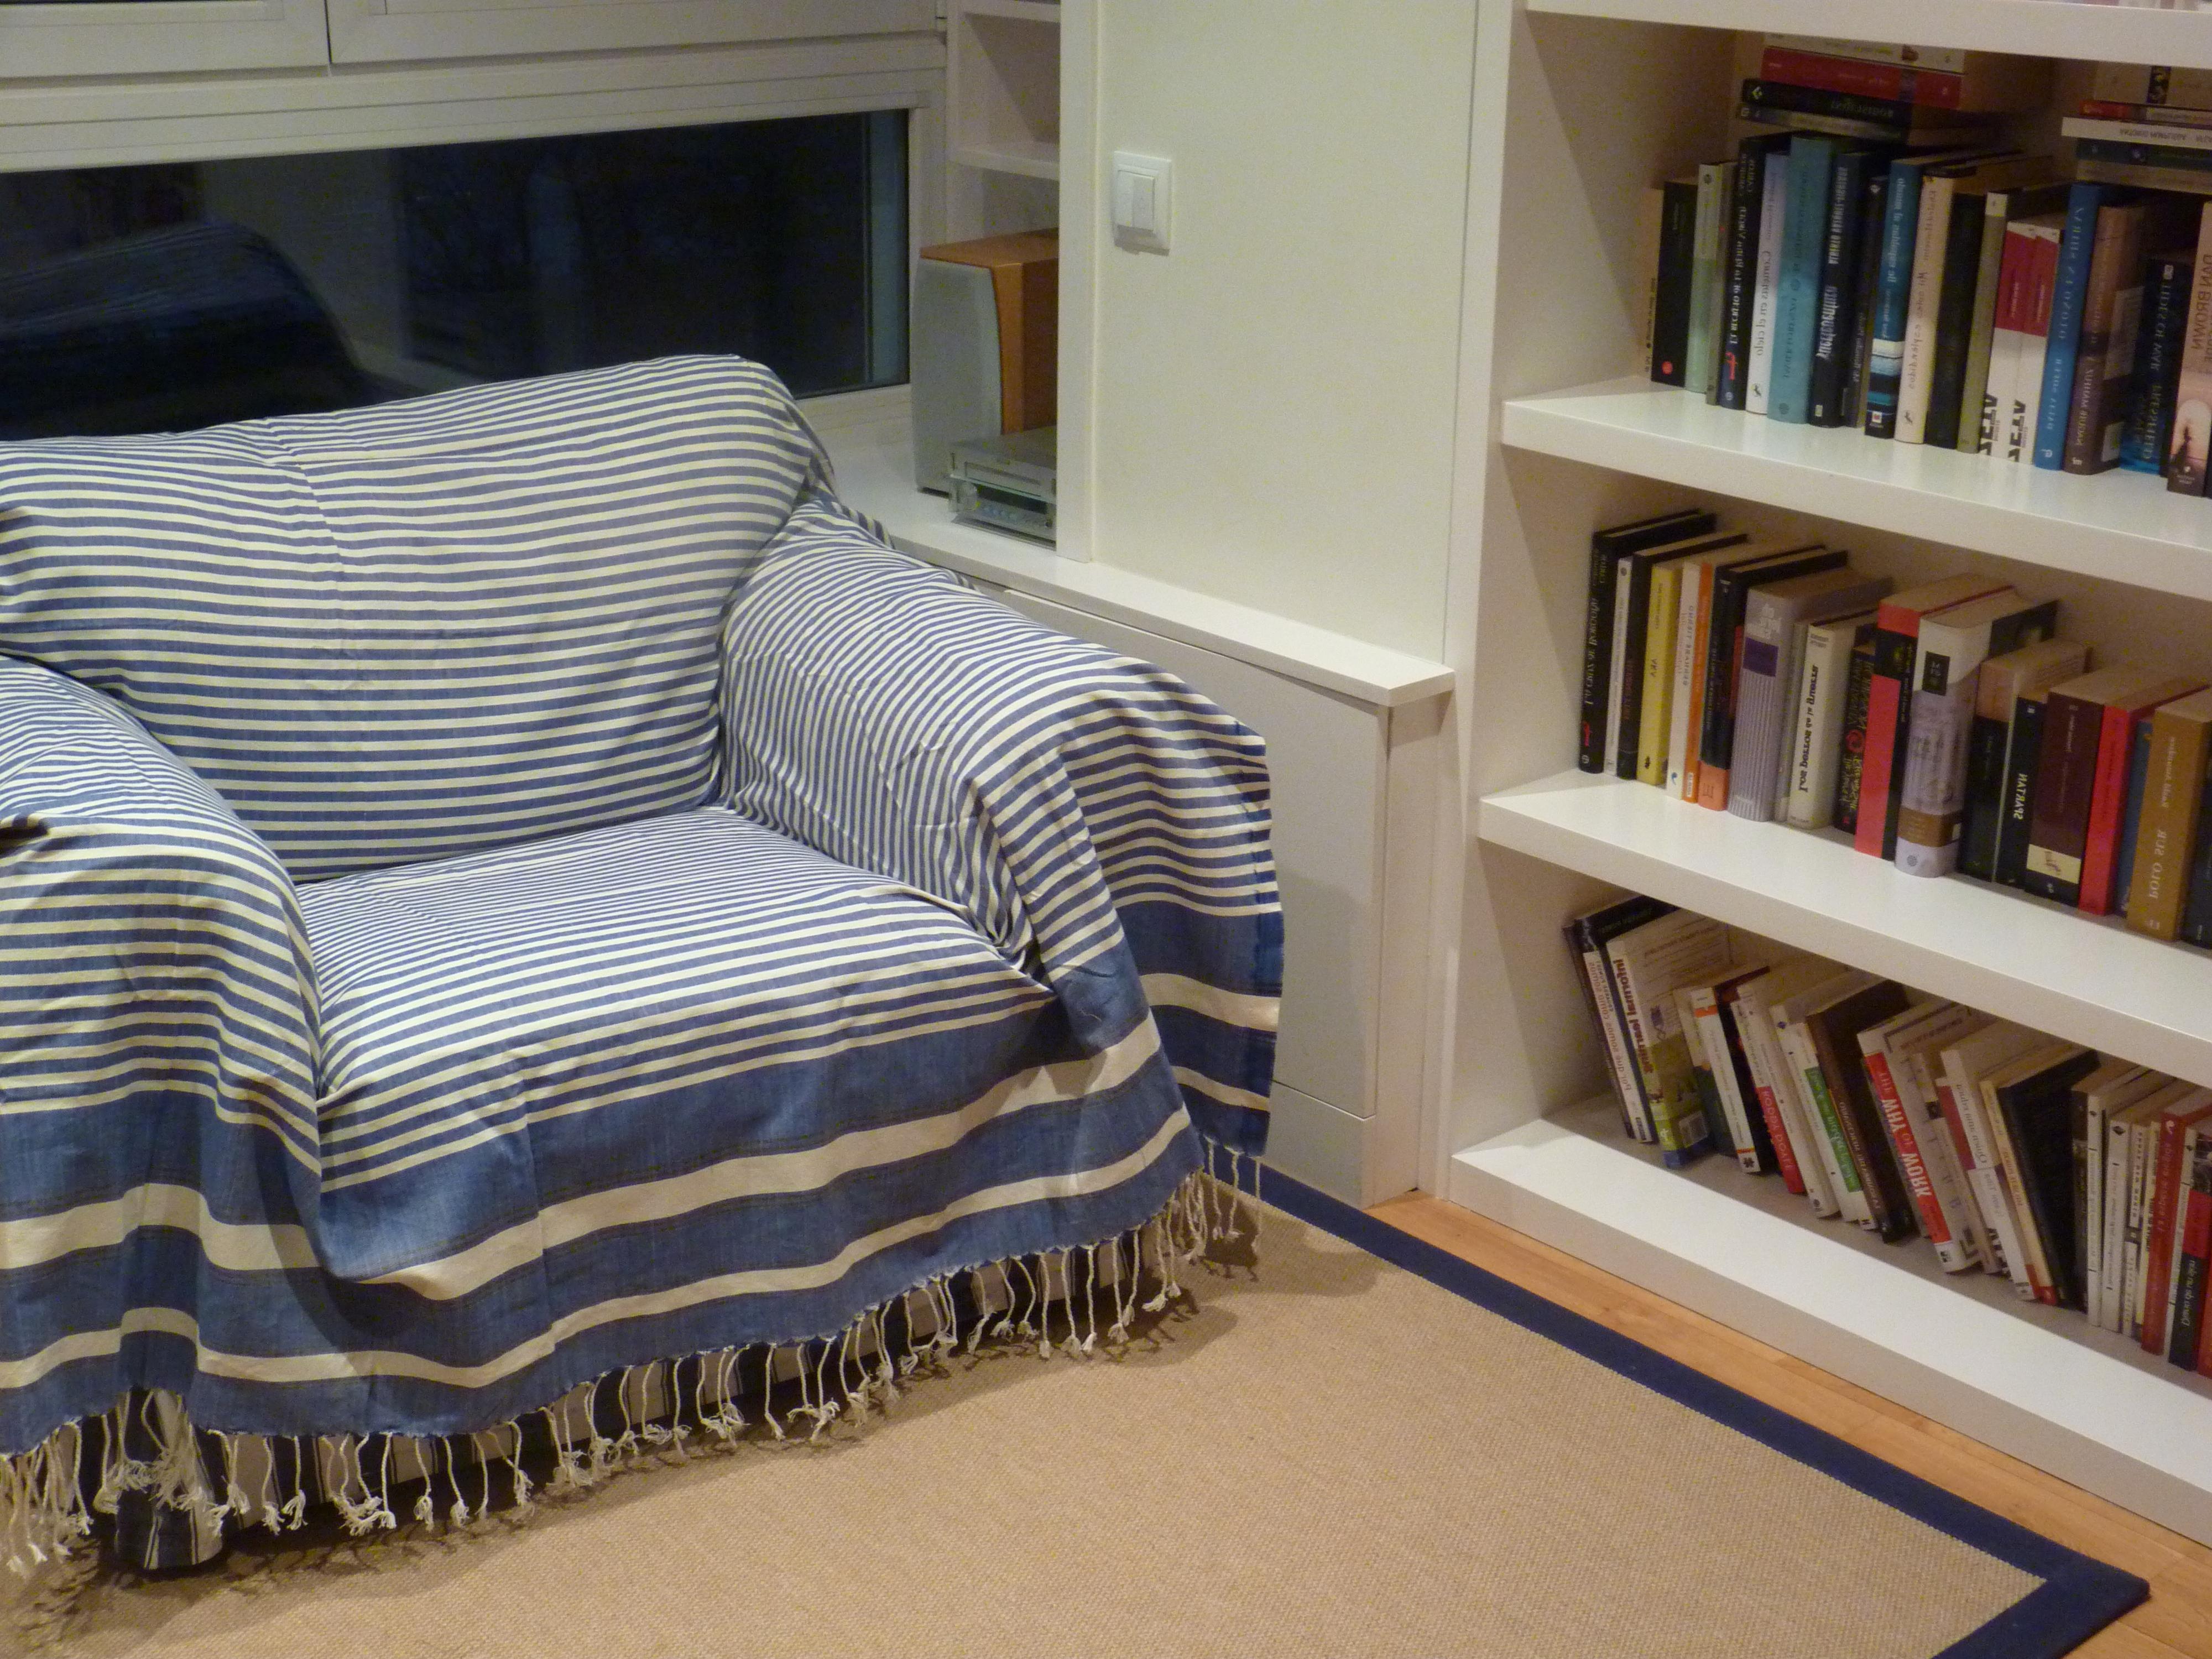 Foulard Cubre sofa J7do Fular sofà Fouta Maxi Azul Oscuro Myfouta